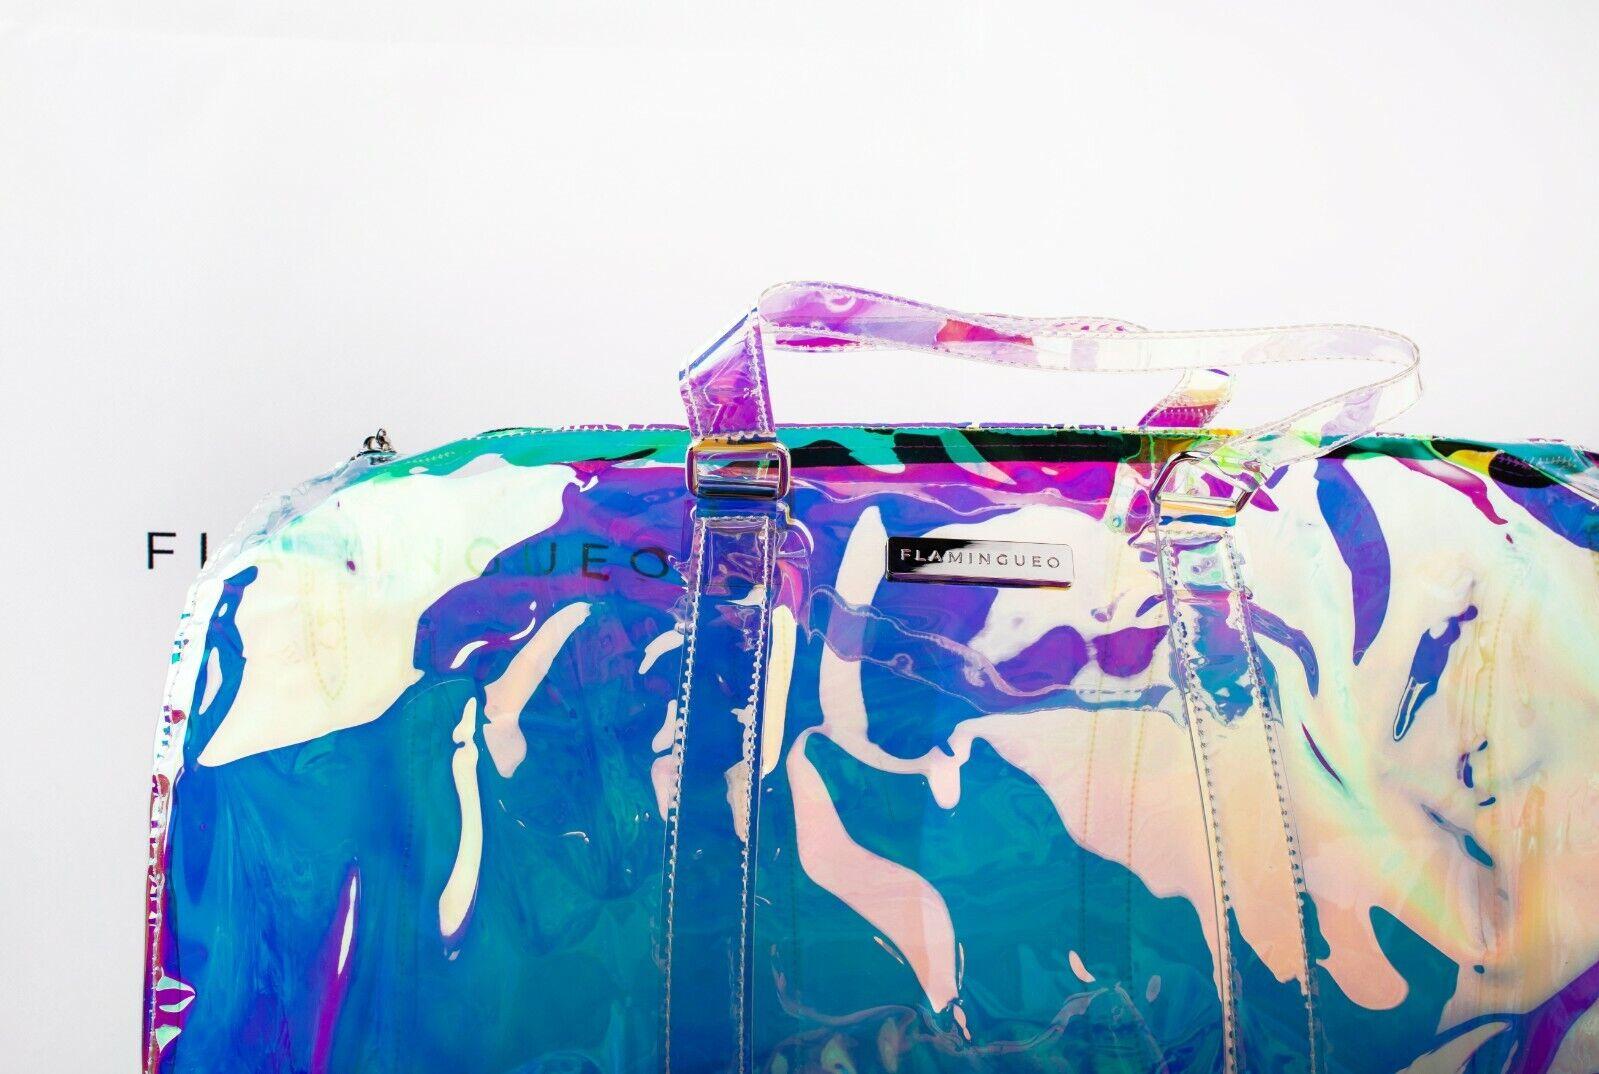 Flamingueo Bolso Transparente Deporte Diseño Holografico Bolsa de Viaje Casual